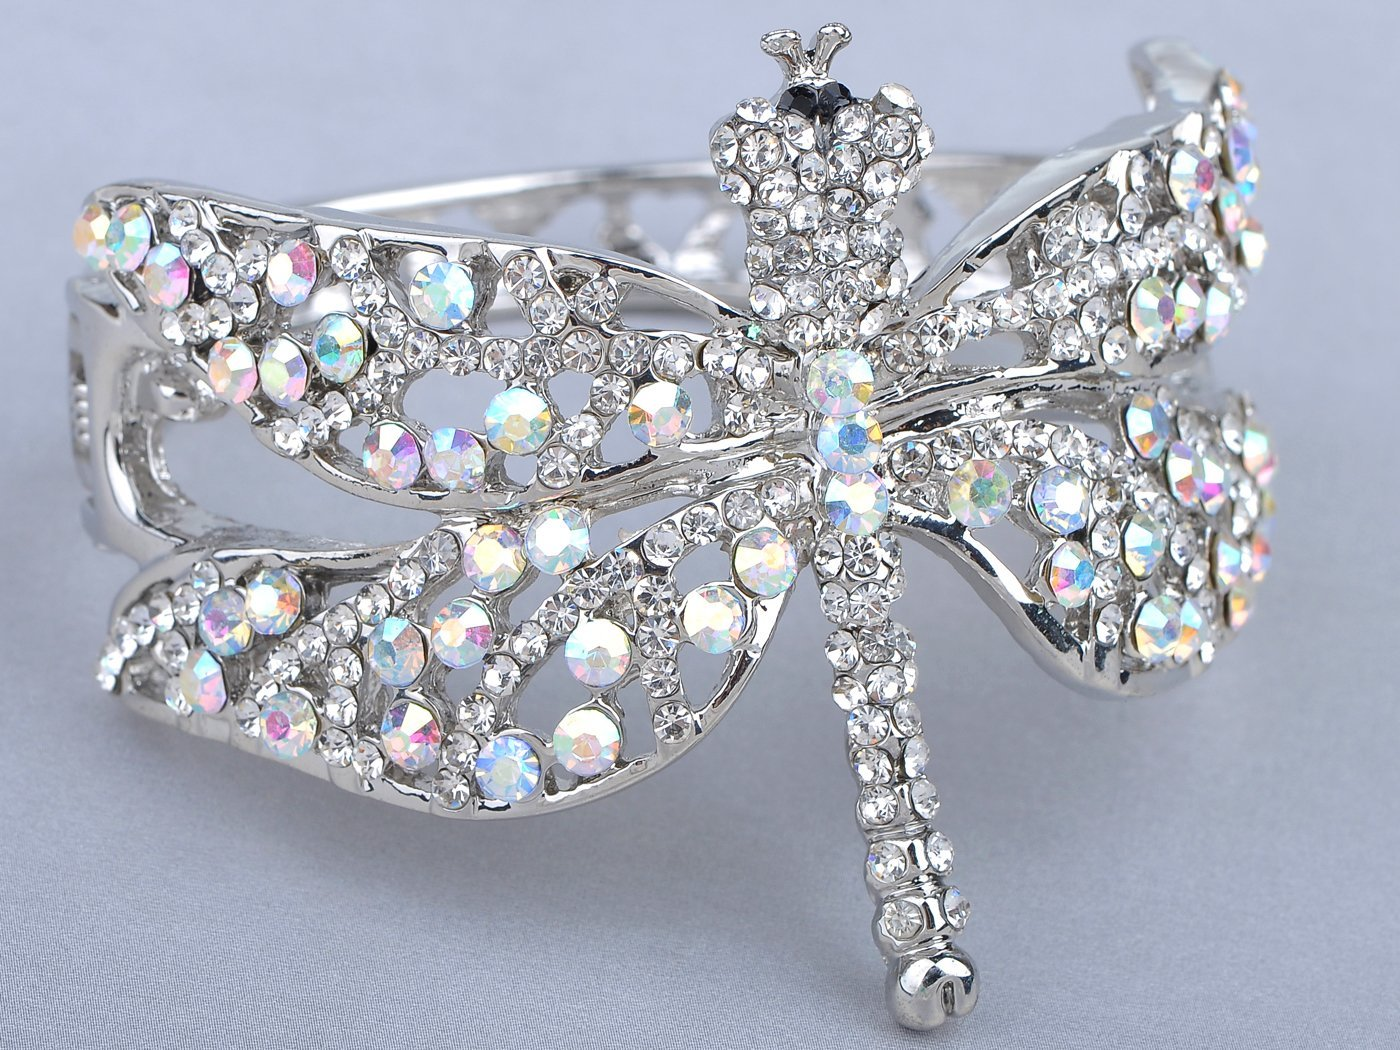 Alilang Womens Silvery Tone Clear Rhinestones Dragonfly Heart Cutout Bangle Bracelet by Alilang (Image #4)